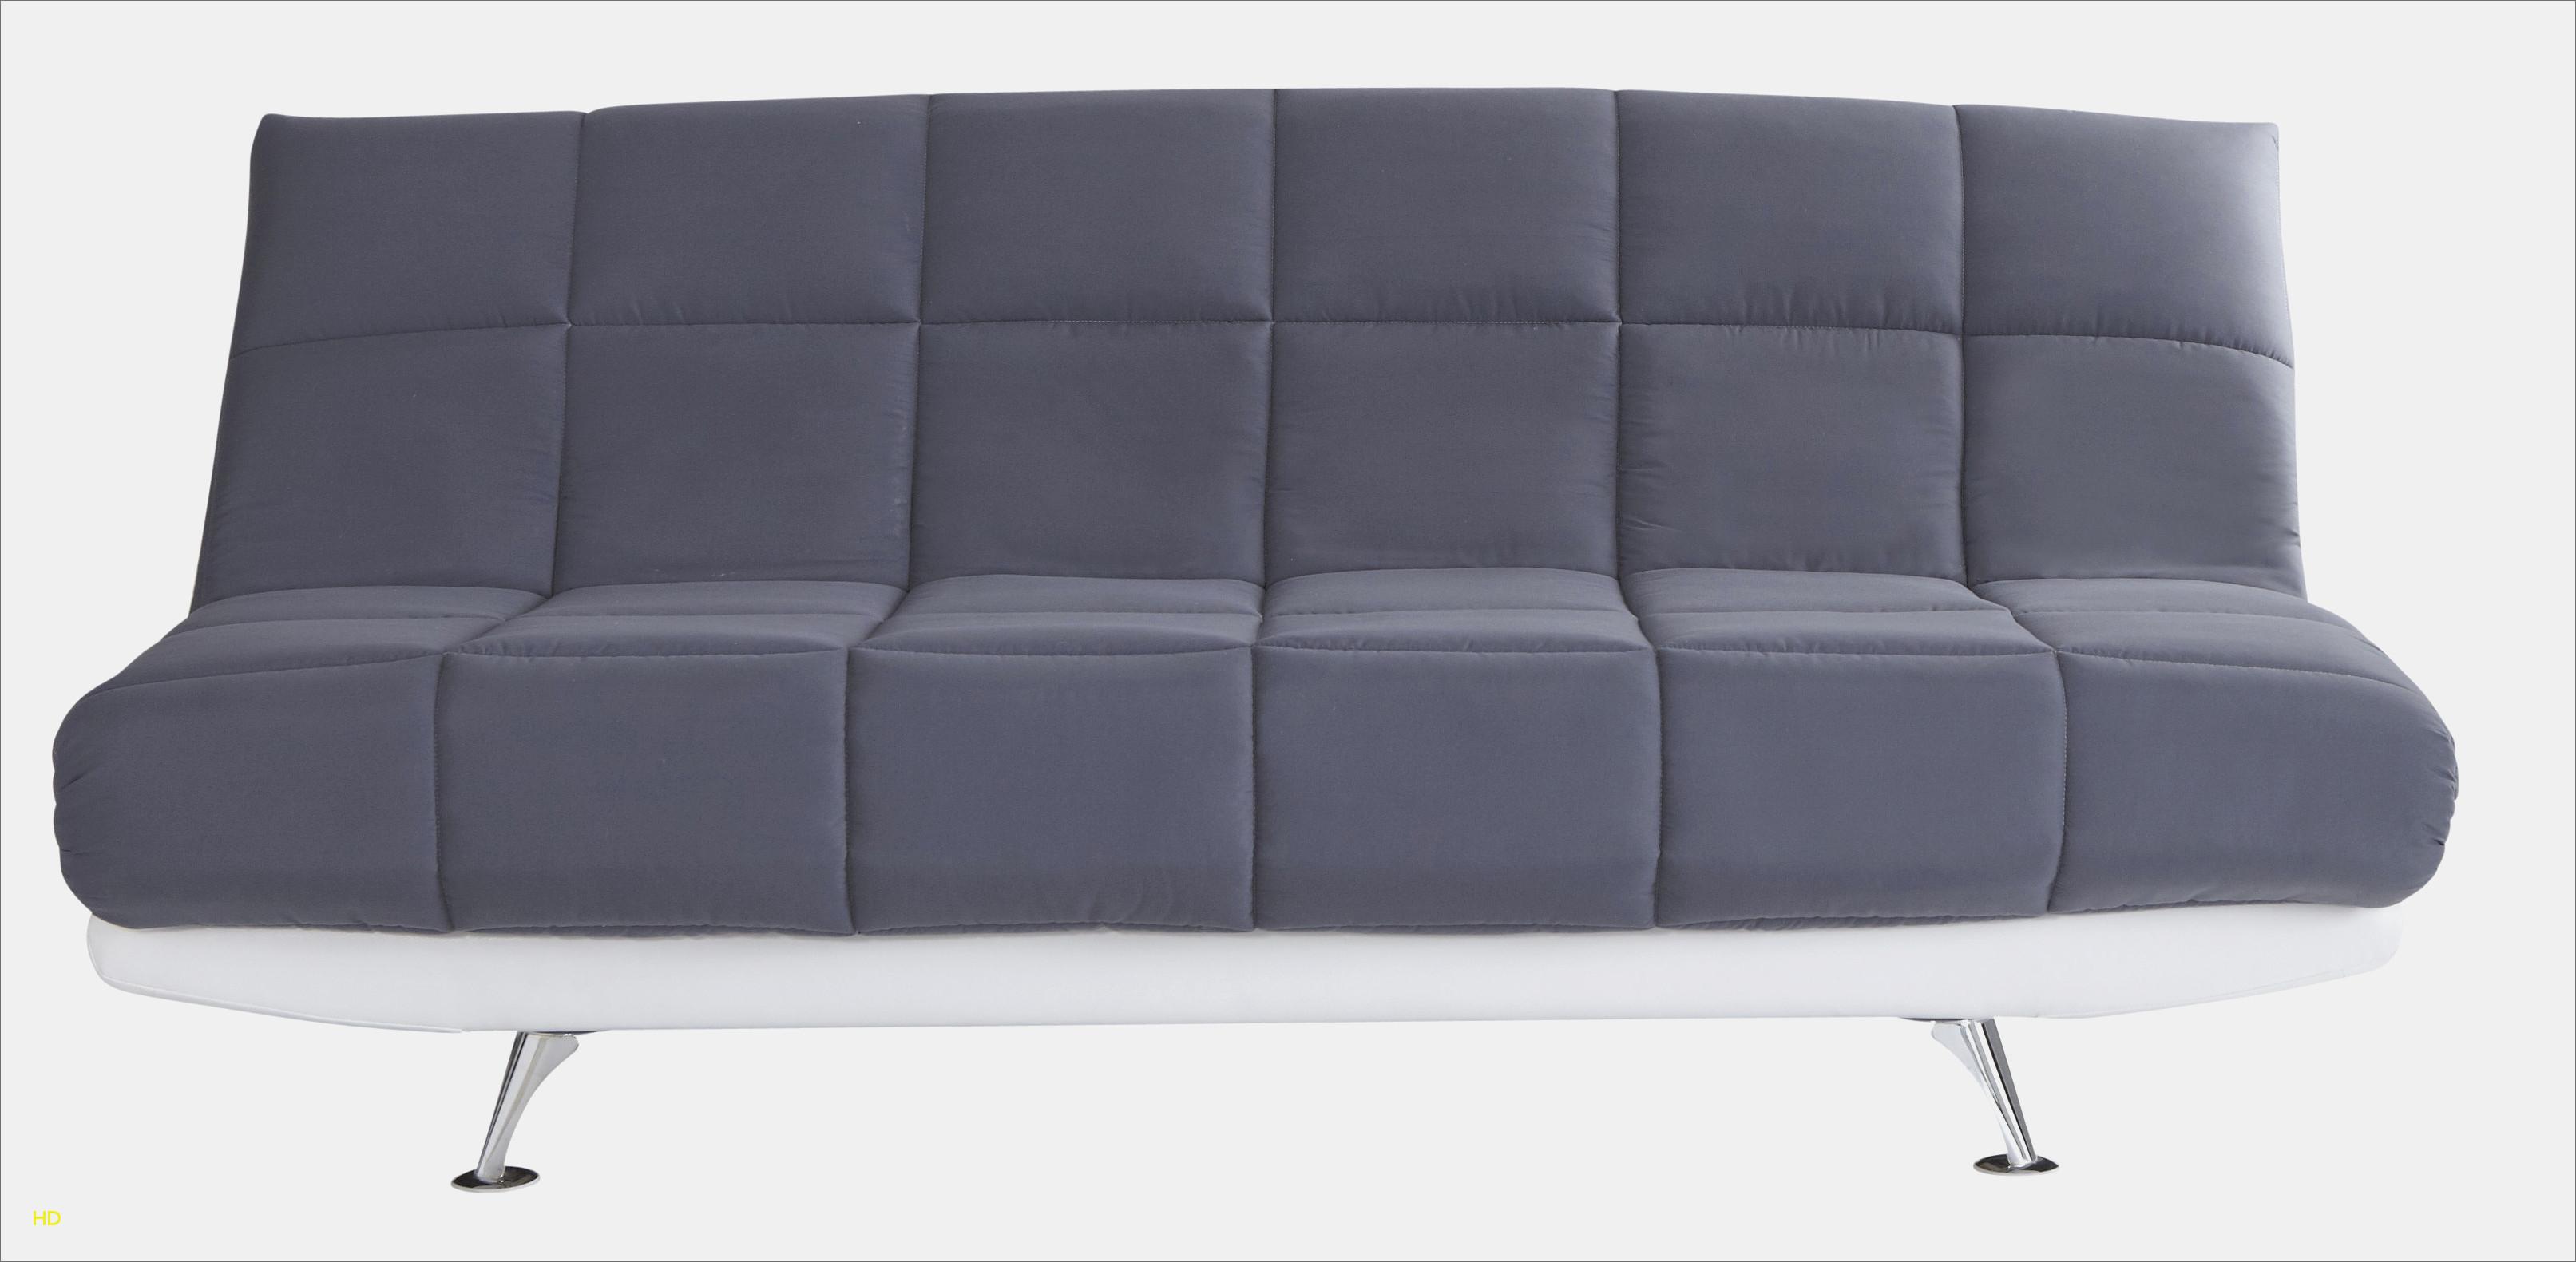 Lit Mezzanine Clic Clac Ikea Luxe Photos Clic Clac Bultex 3 Nice Design 12